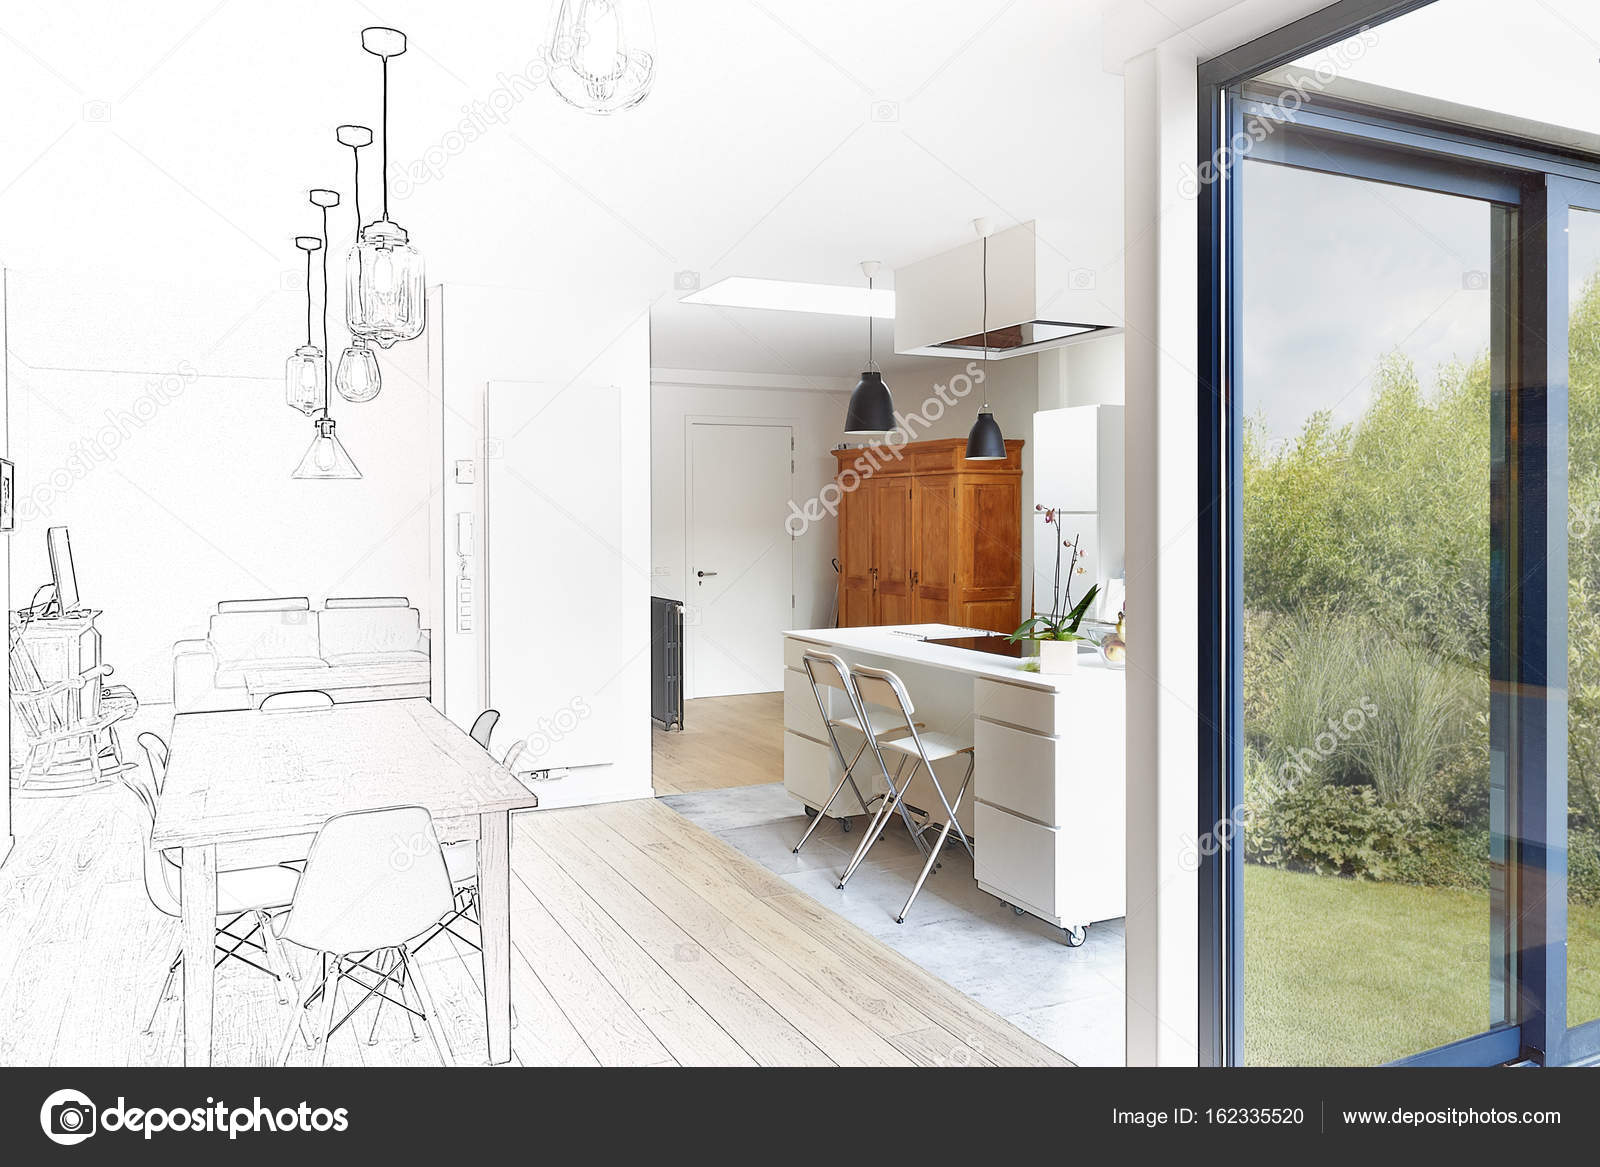 Moderne Radiator Woonkamer : Moderne luxe woonkamer en keuken u stockfoto bombaert